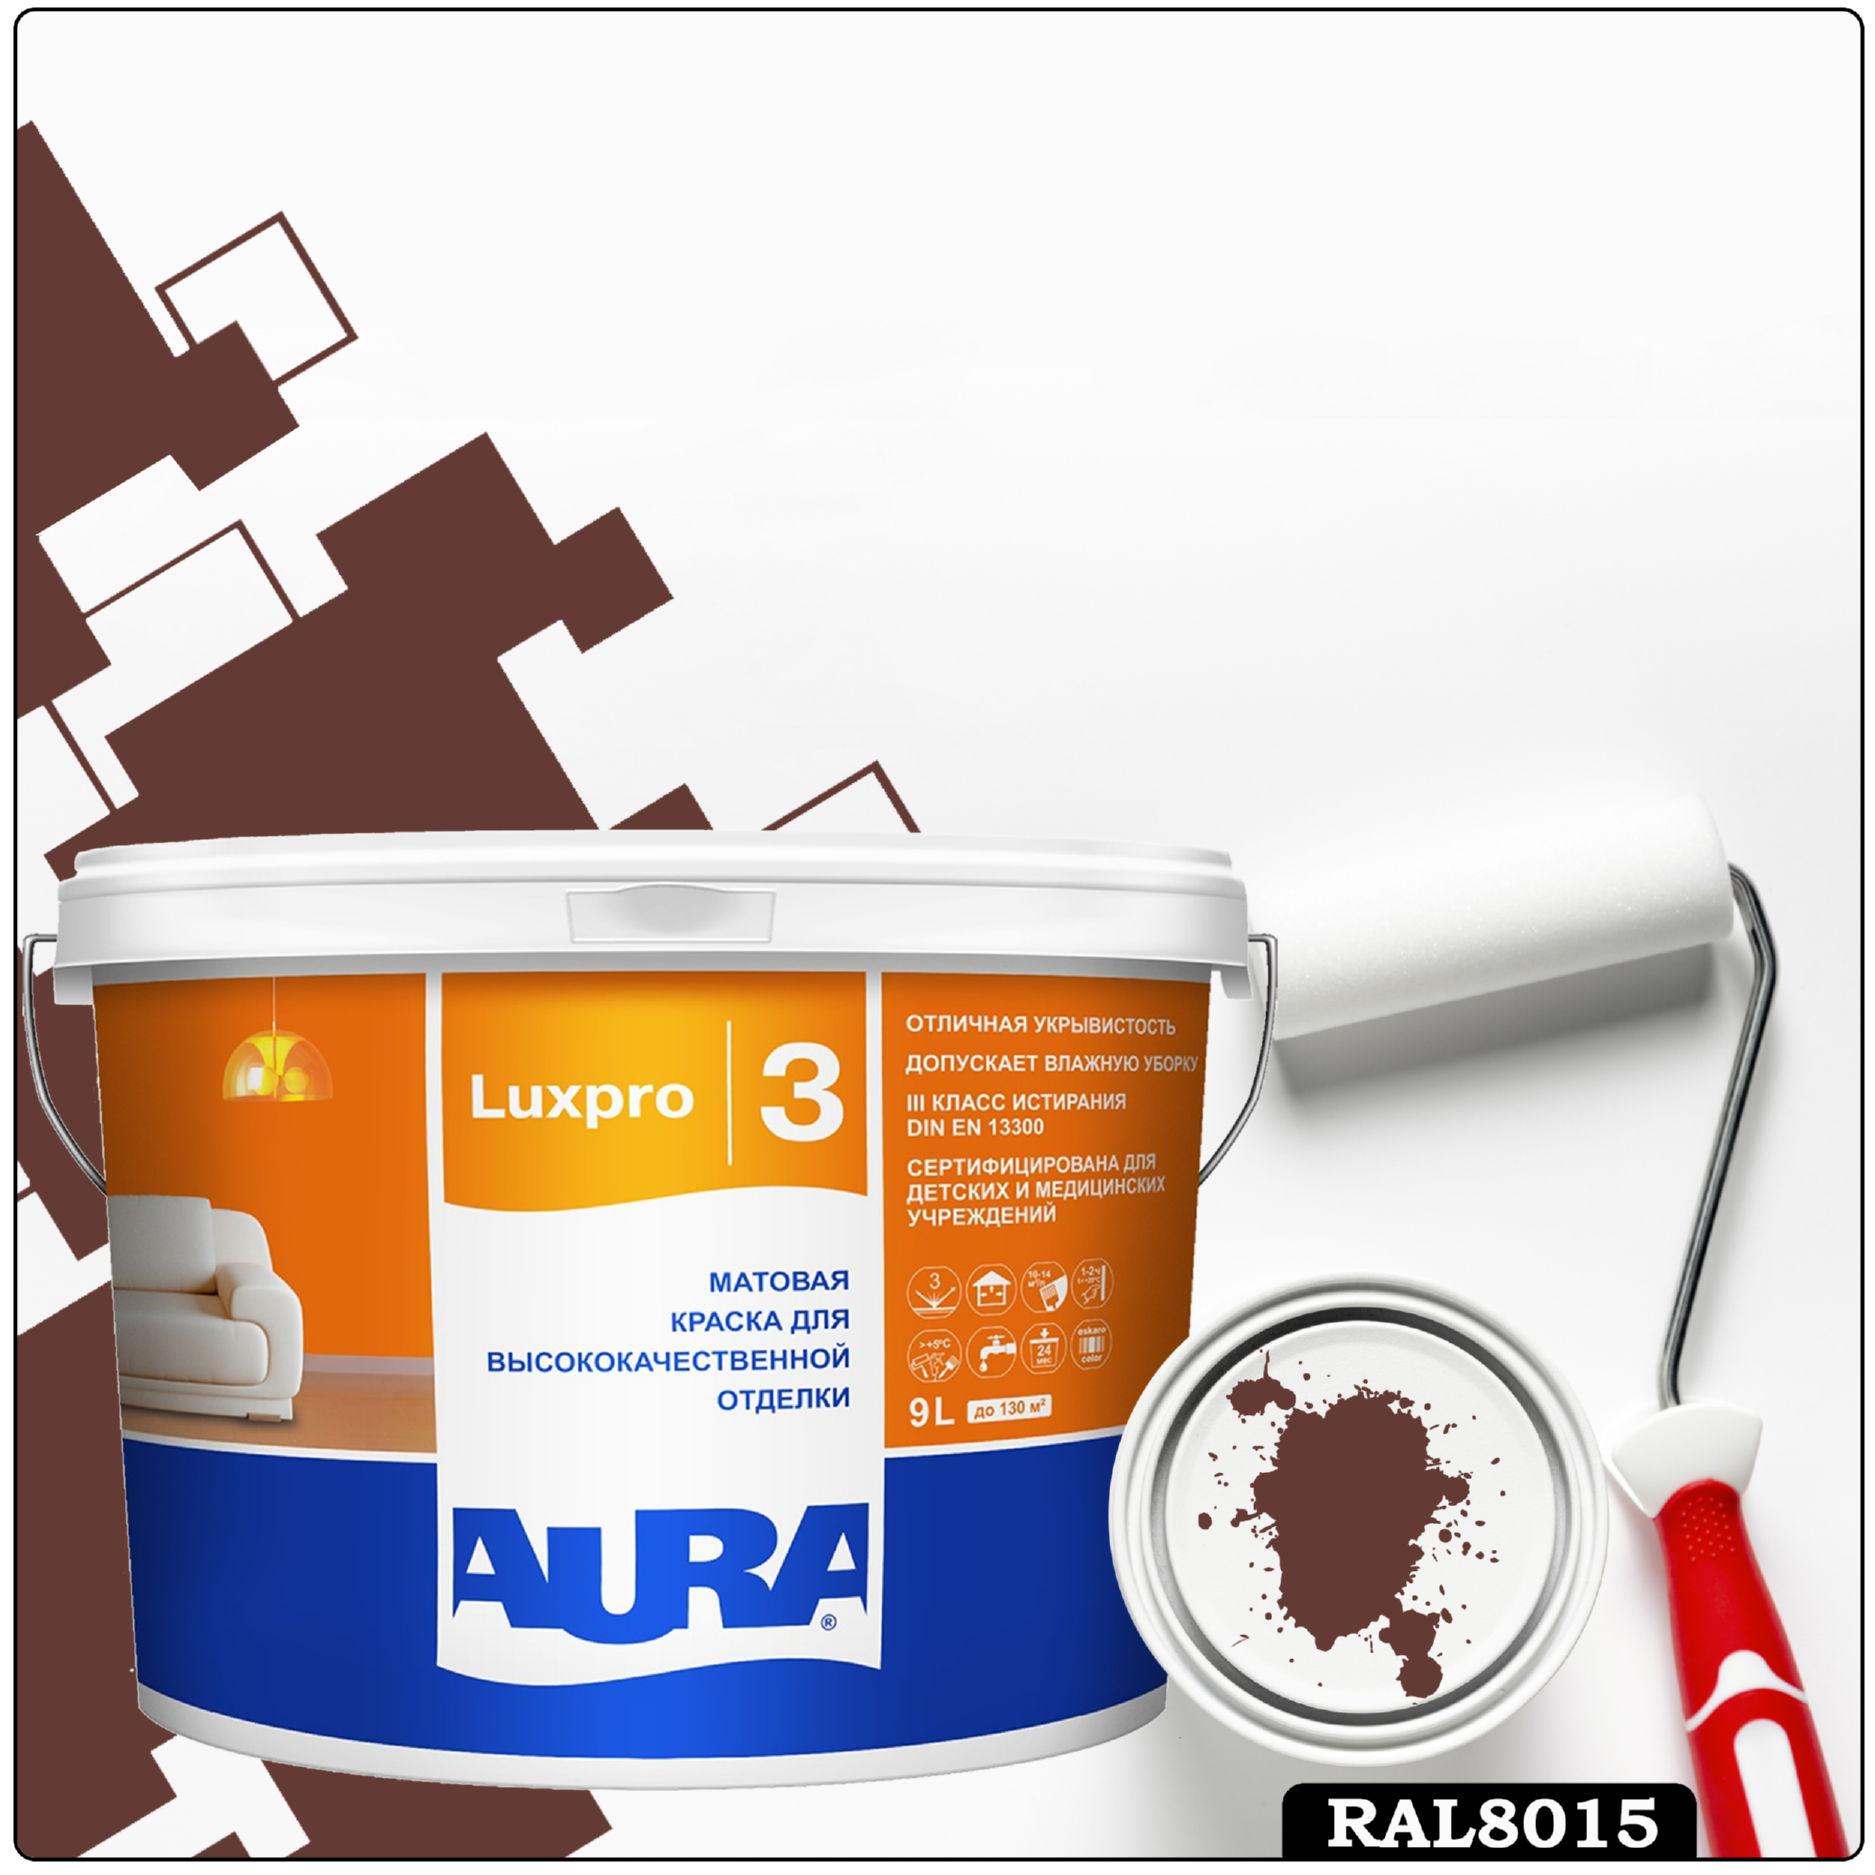 Фото 11 - Краска Aura LuxPRO 3, RAL 8015 Коричневый каштан, латексная, шелково-матовая, интерьерная, 9л, Аура.